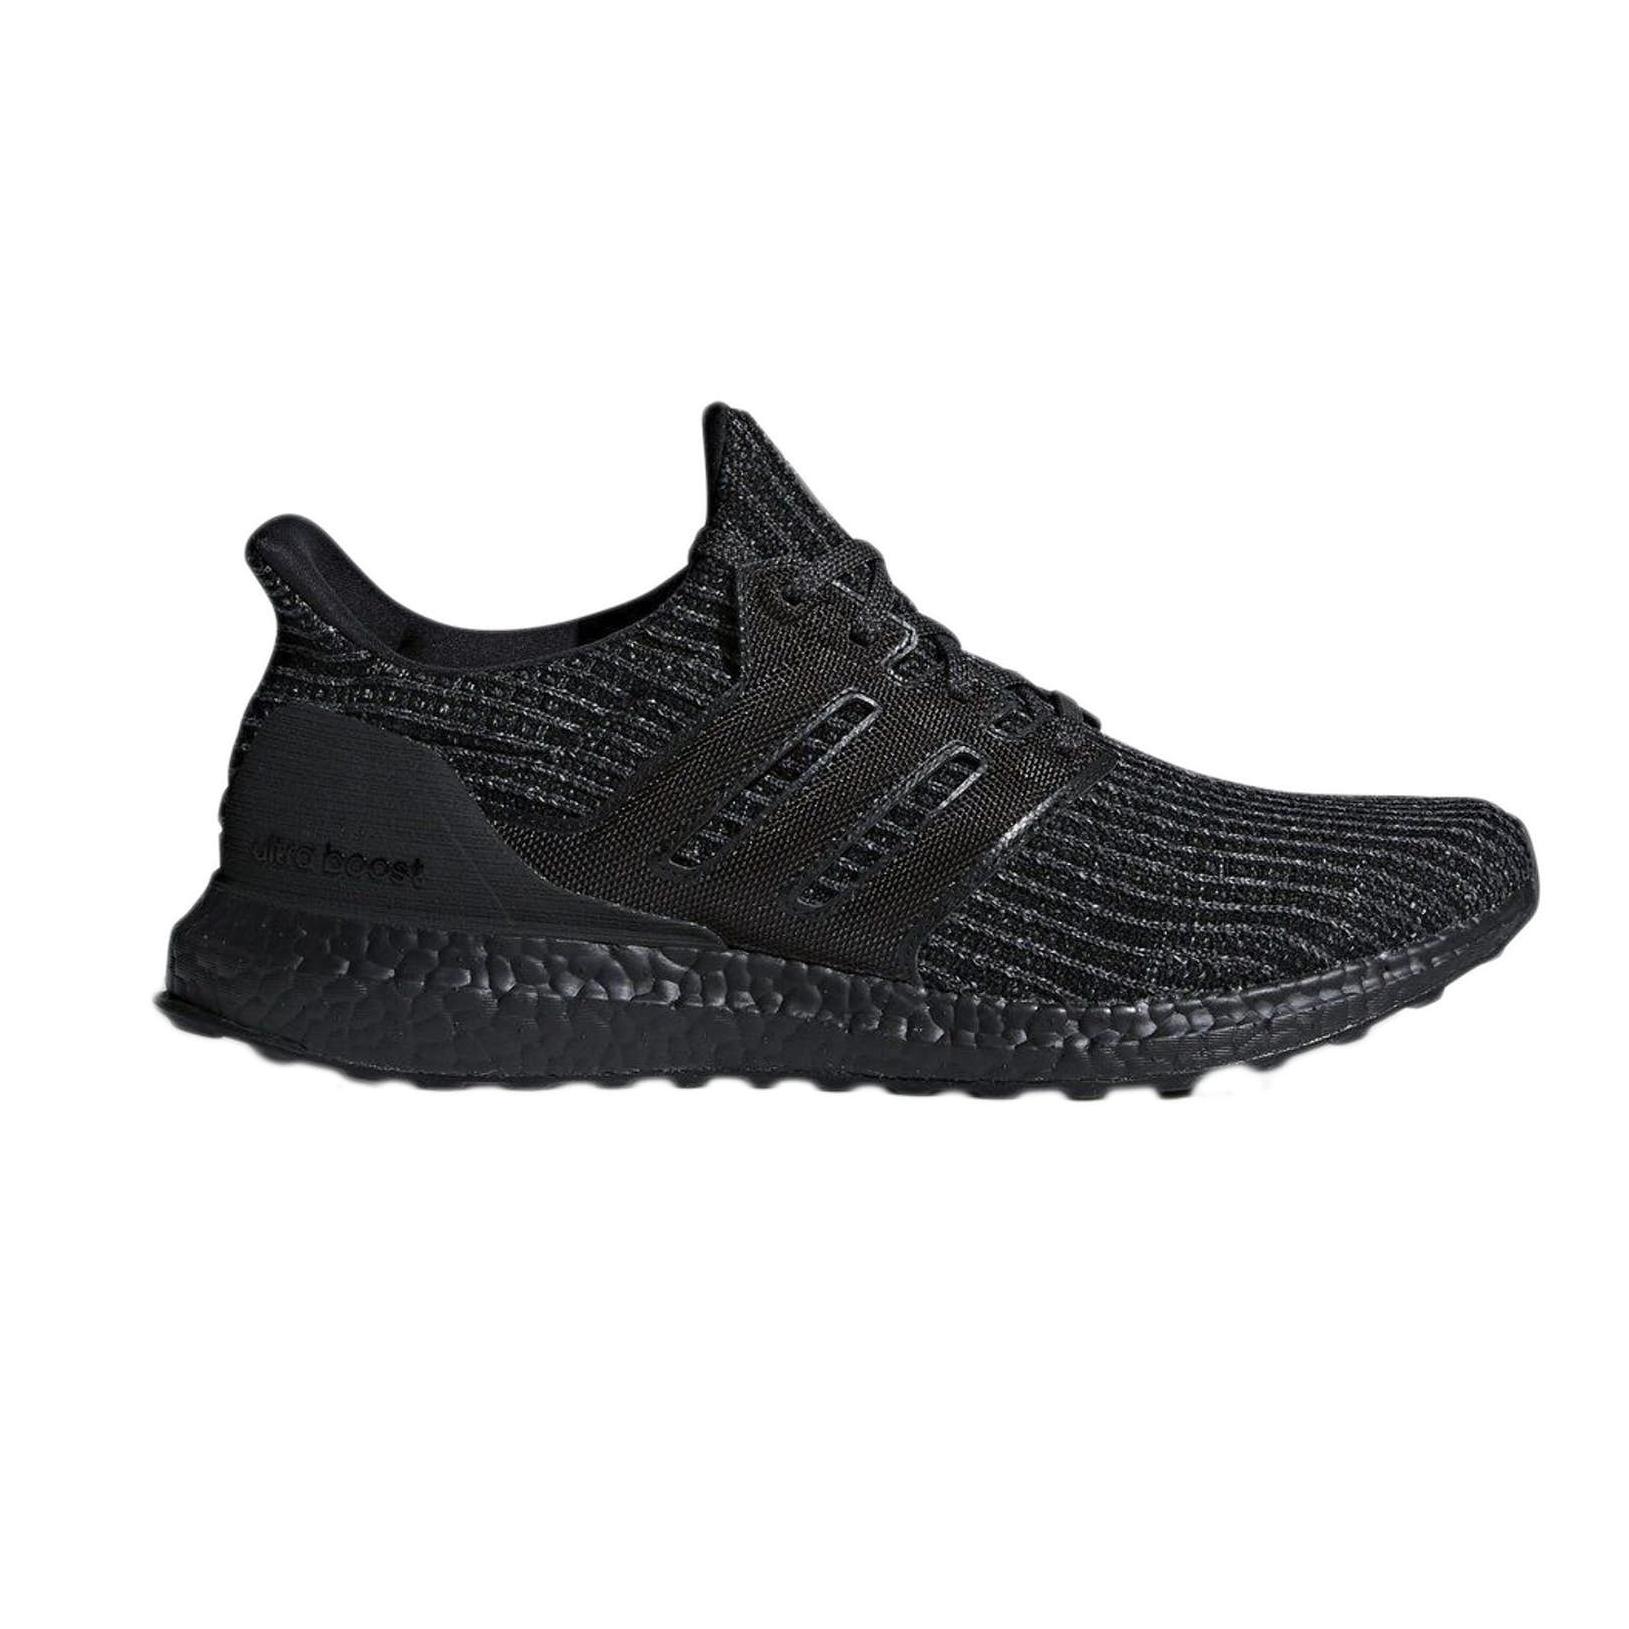 4c5e703b76616 Giày Sneaker Adidas Ultra Boost 4.0 Triple Black